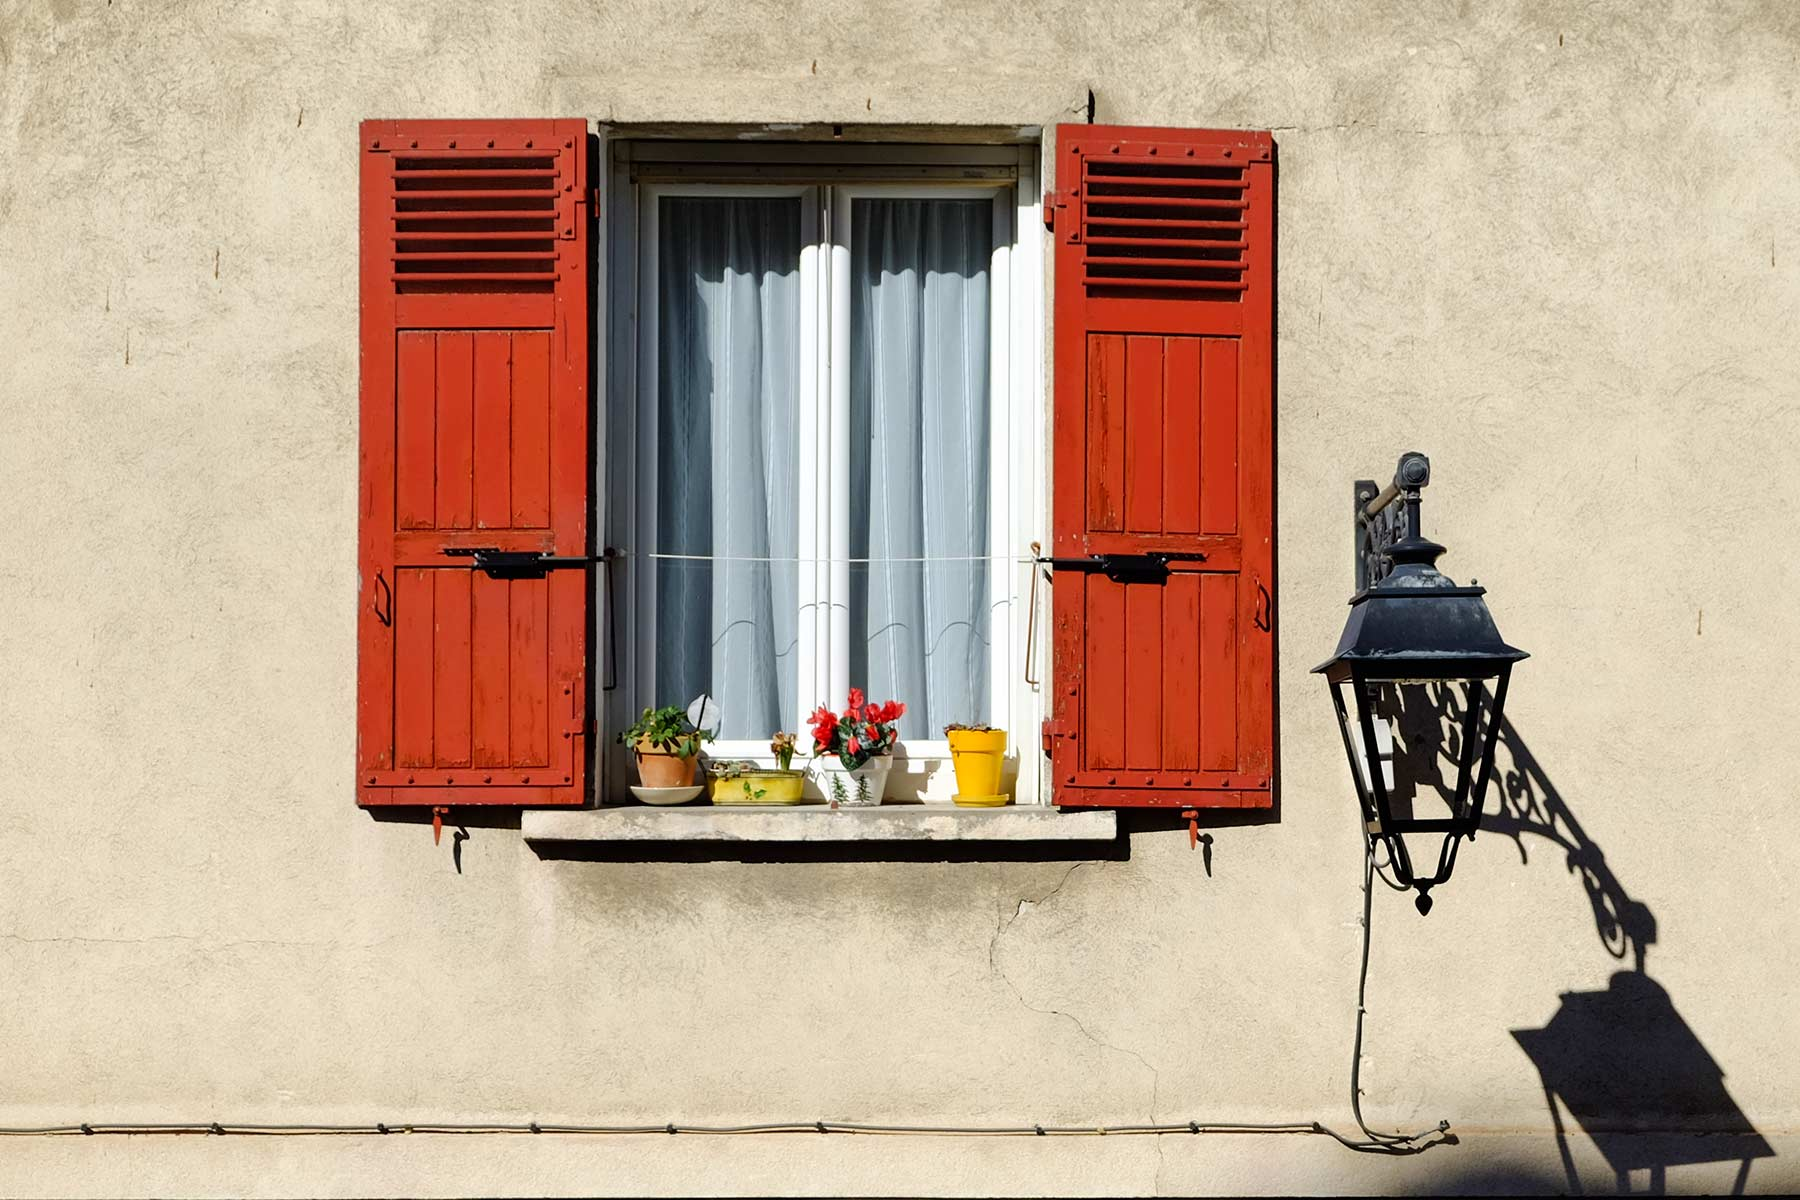 Arles in der Provence, Frankreich